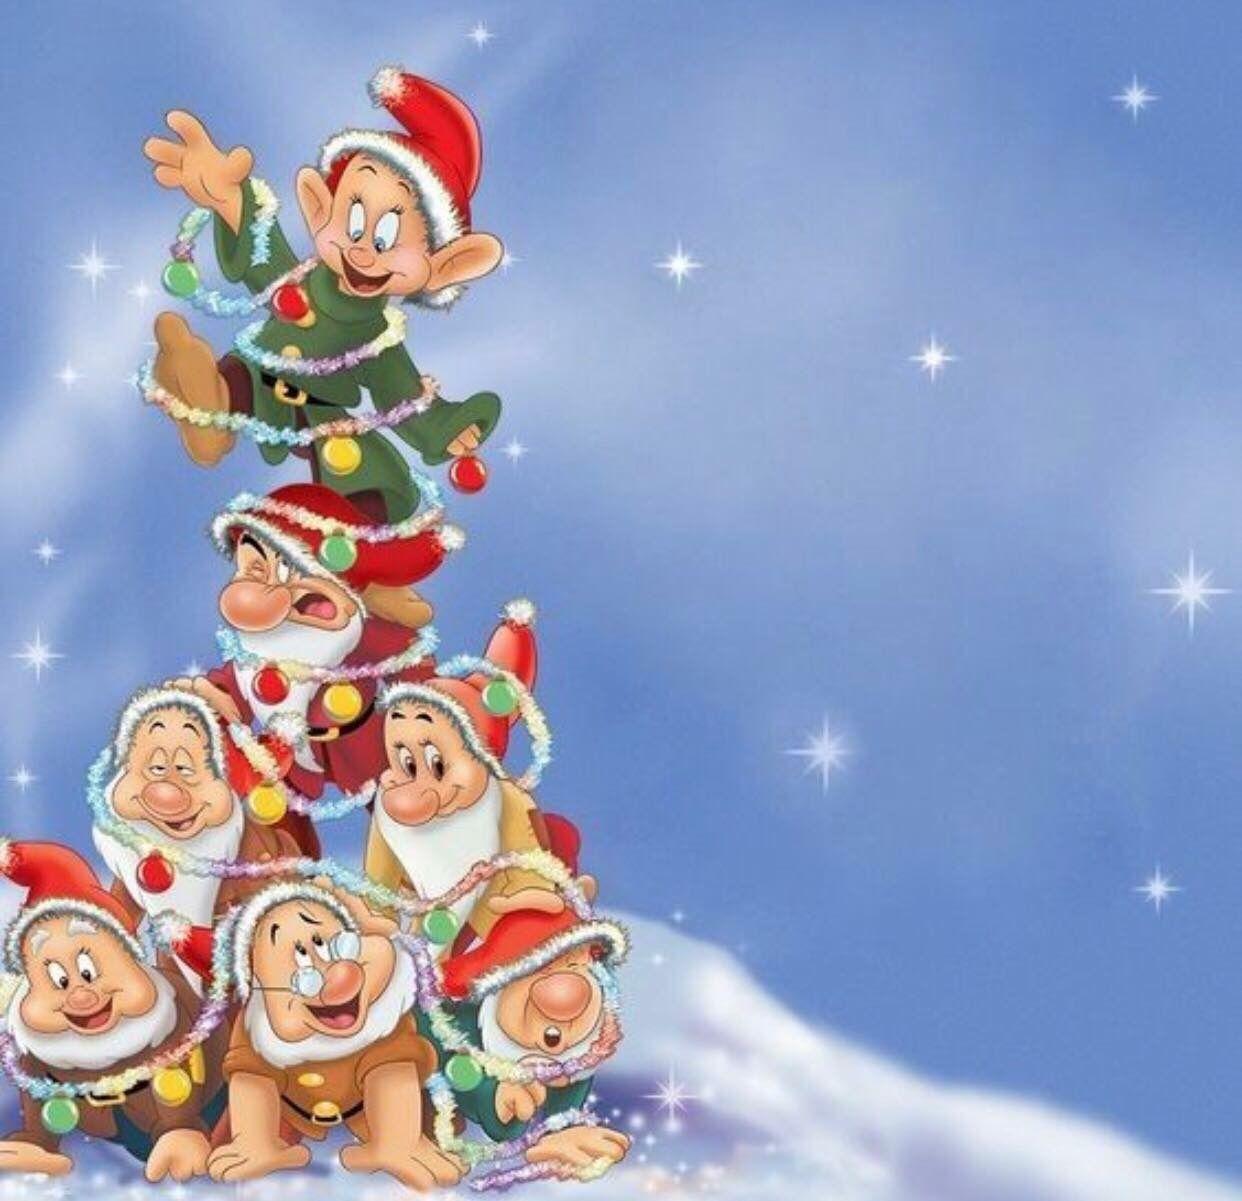 7 Dwarfs Christmas Tree Disney Christmas Christmas Cartoons Christmas Wallpaper